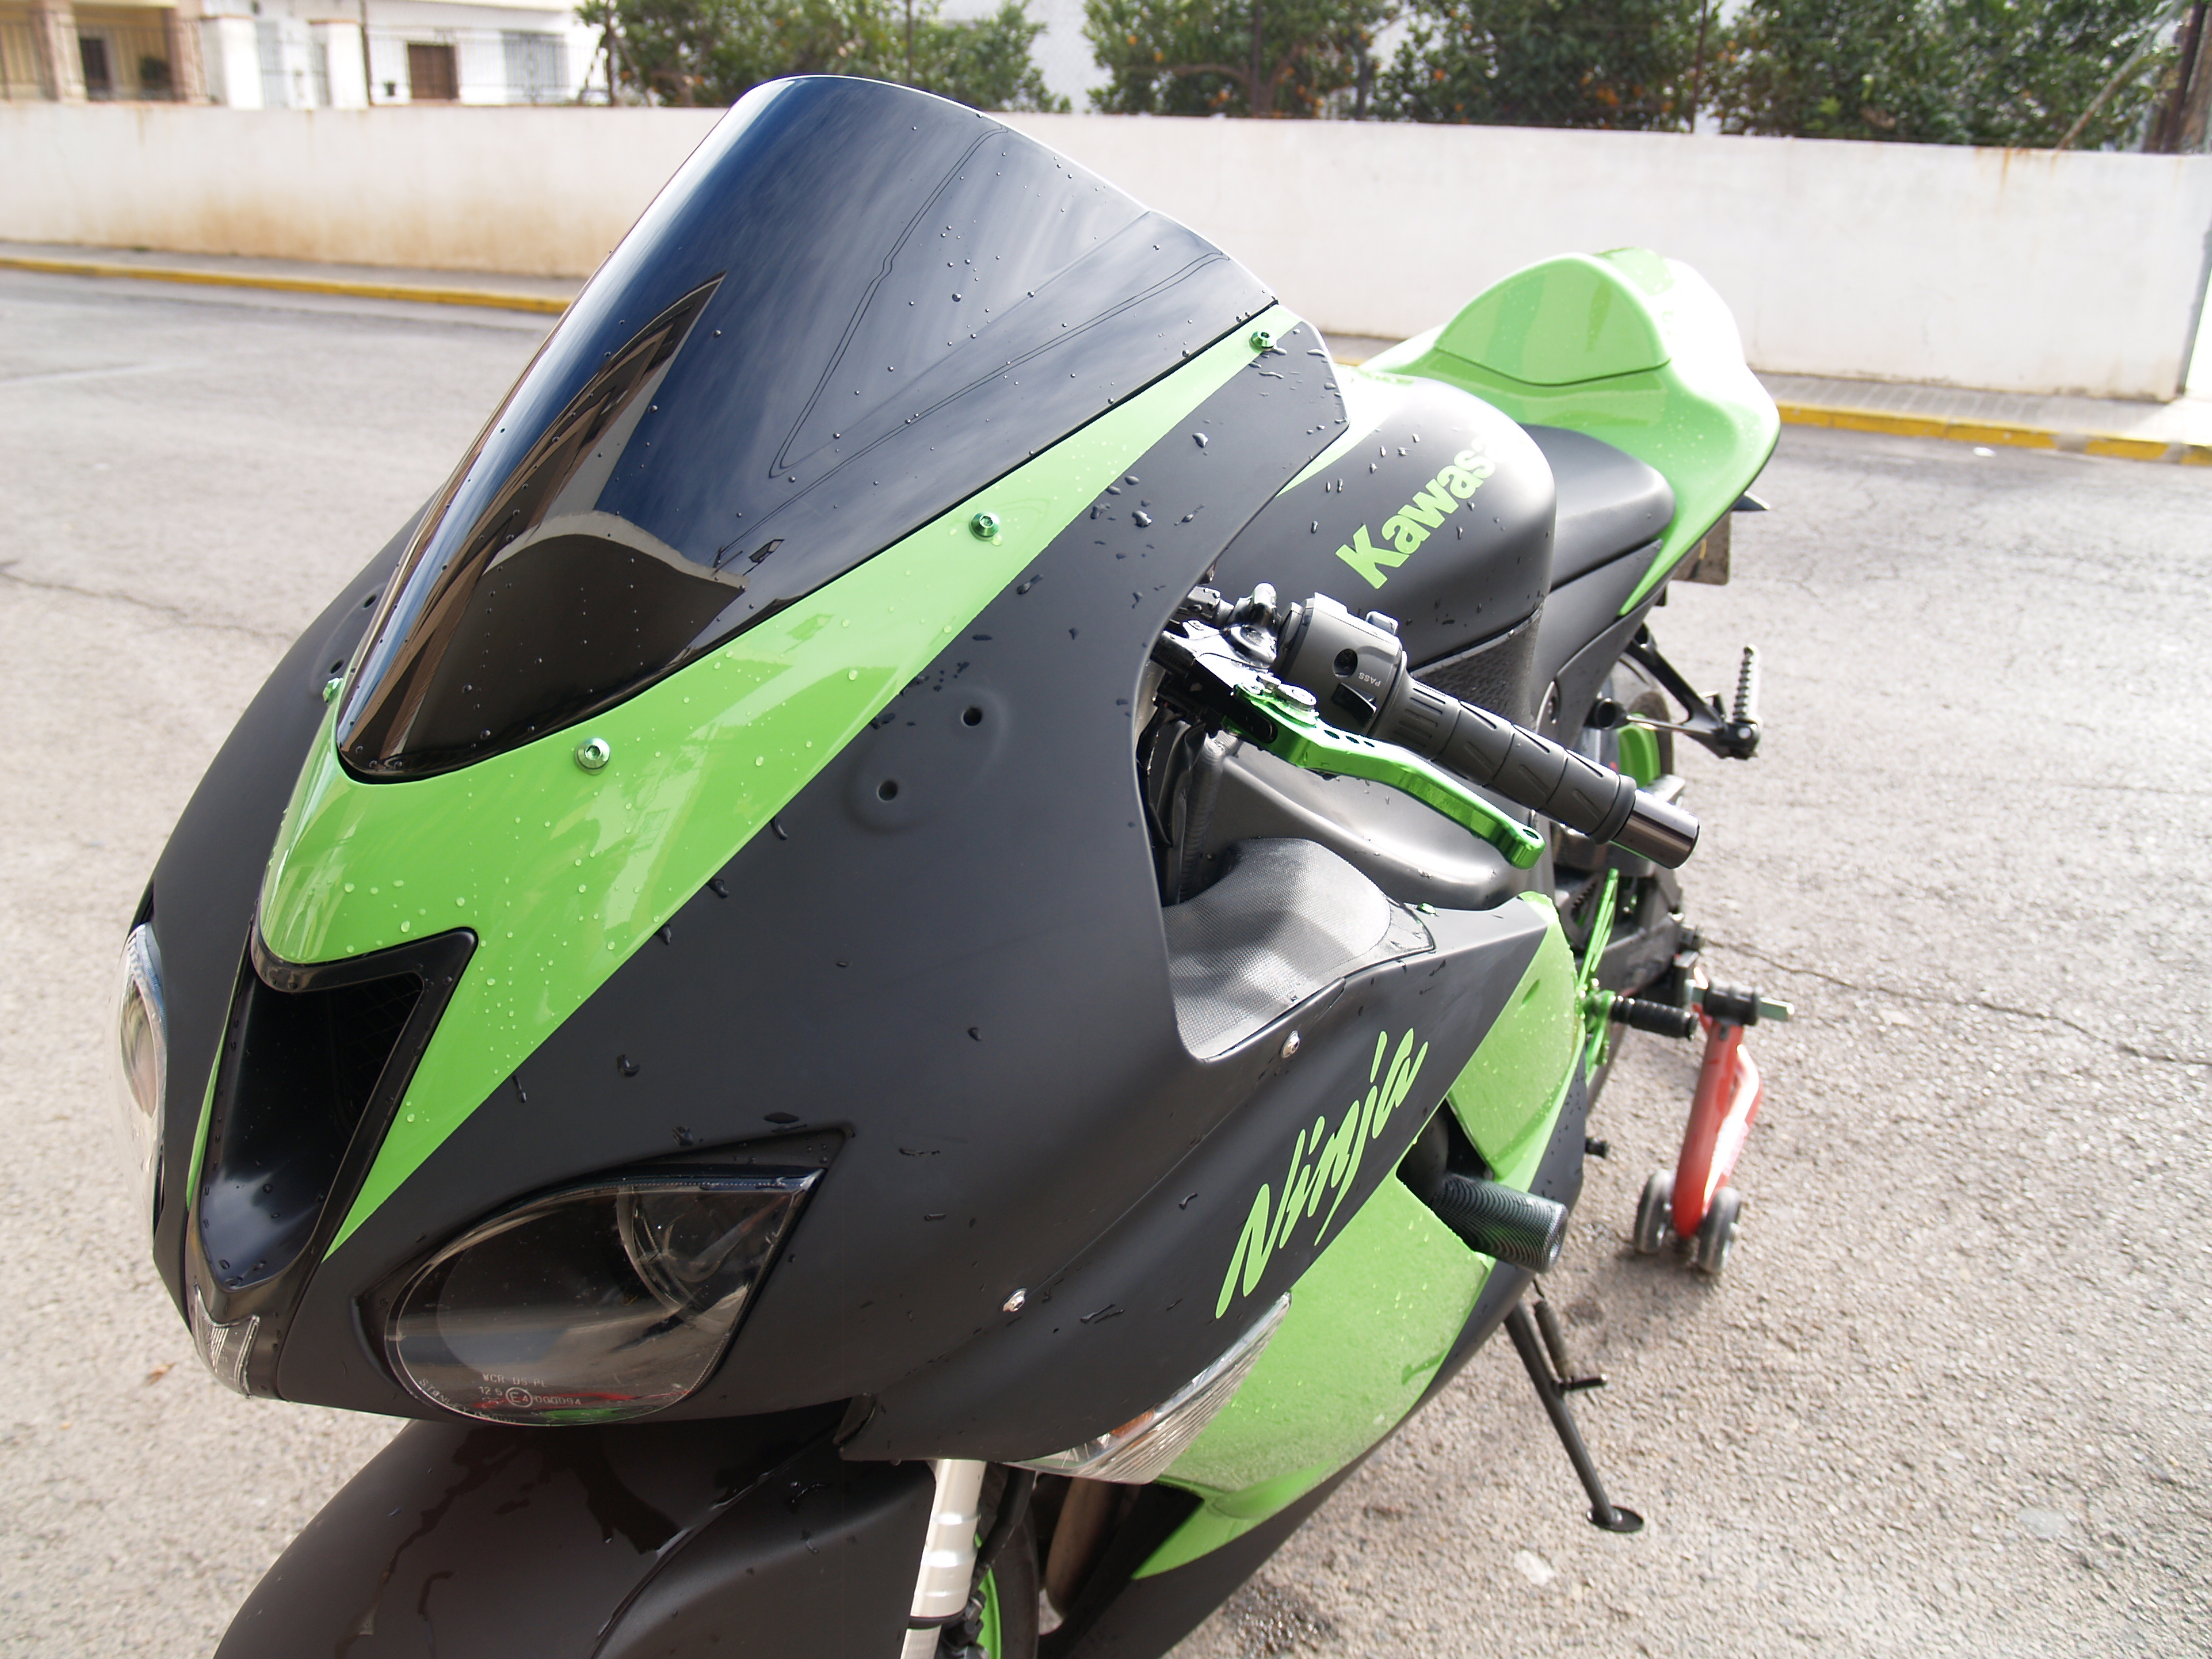 Pintura moto Kawasaki ZX6-R Verde/Negro